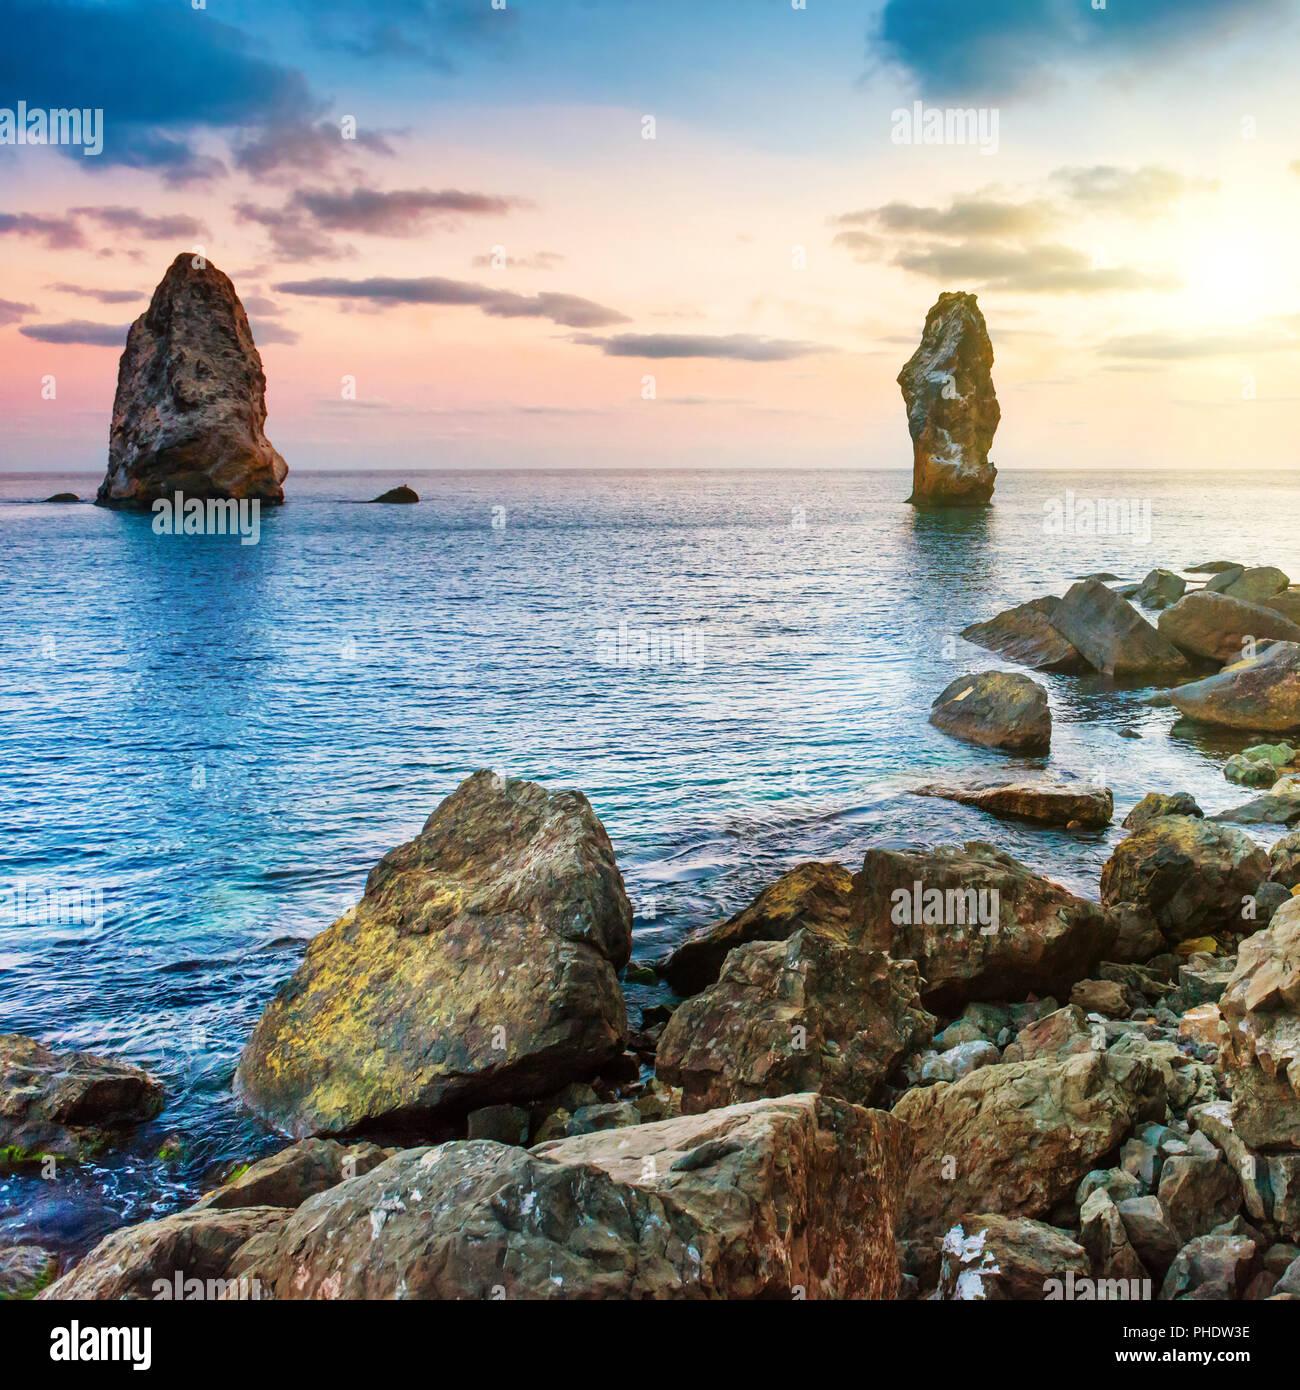 Sunset on the sea above big rocks - Stock Image